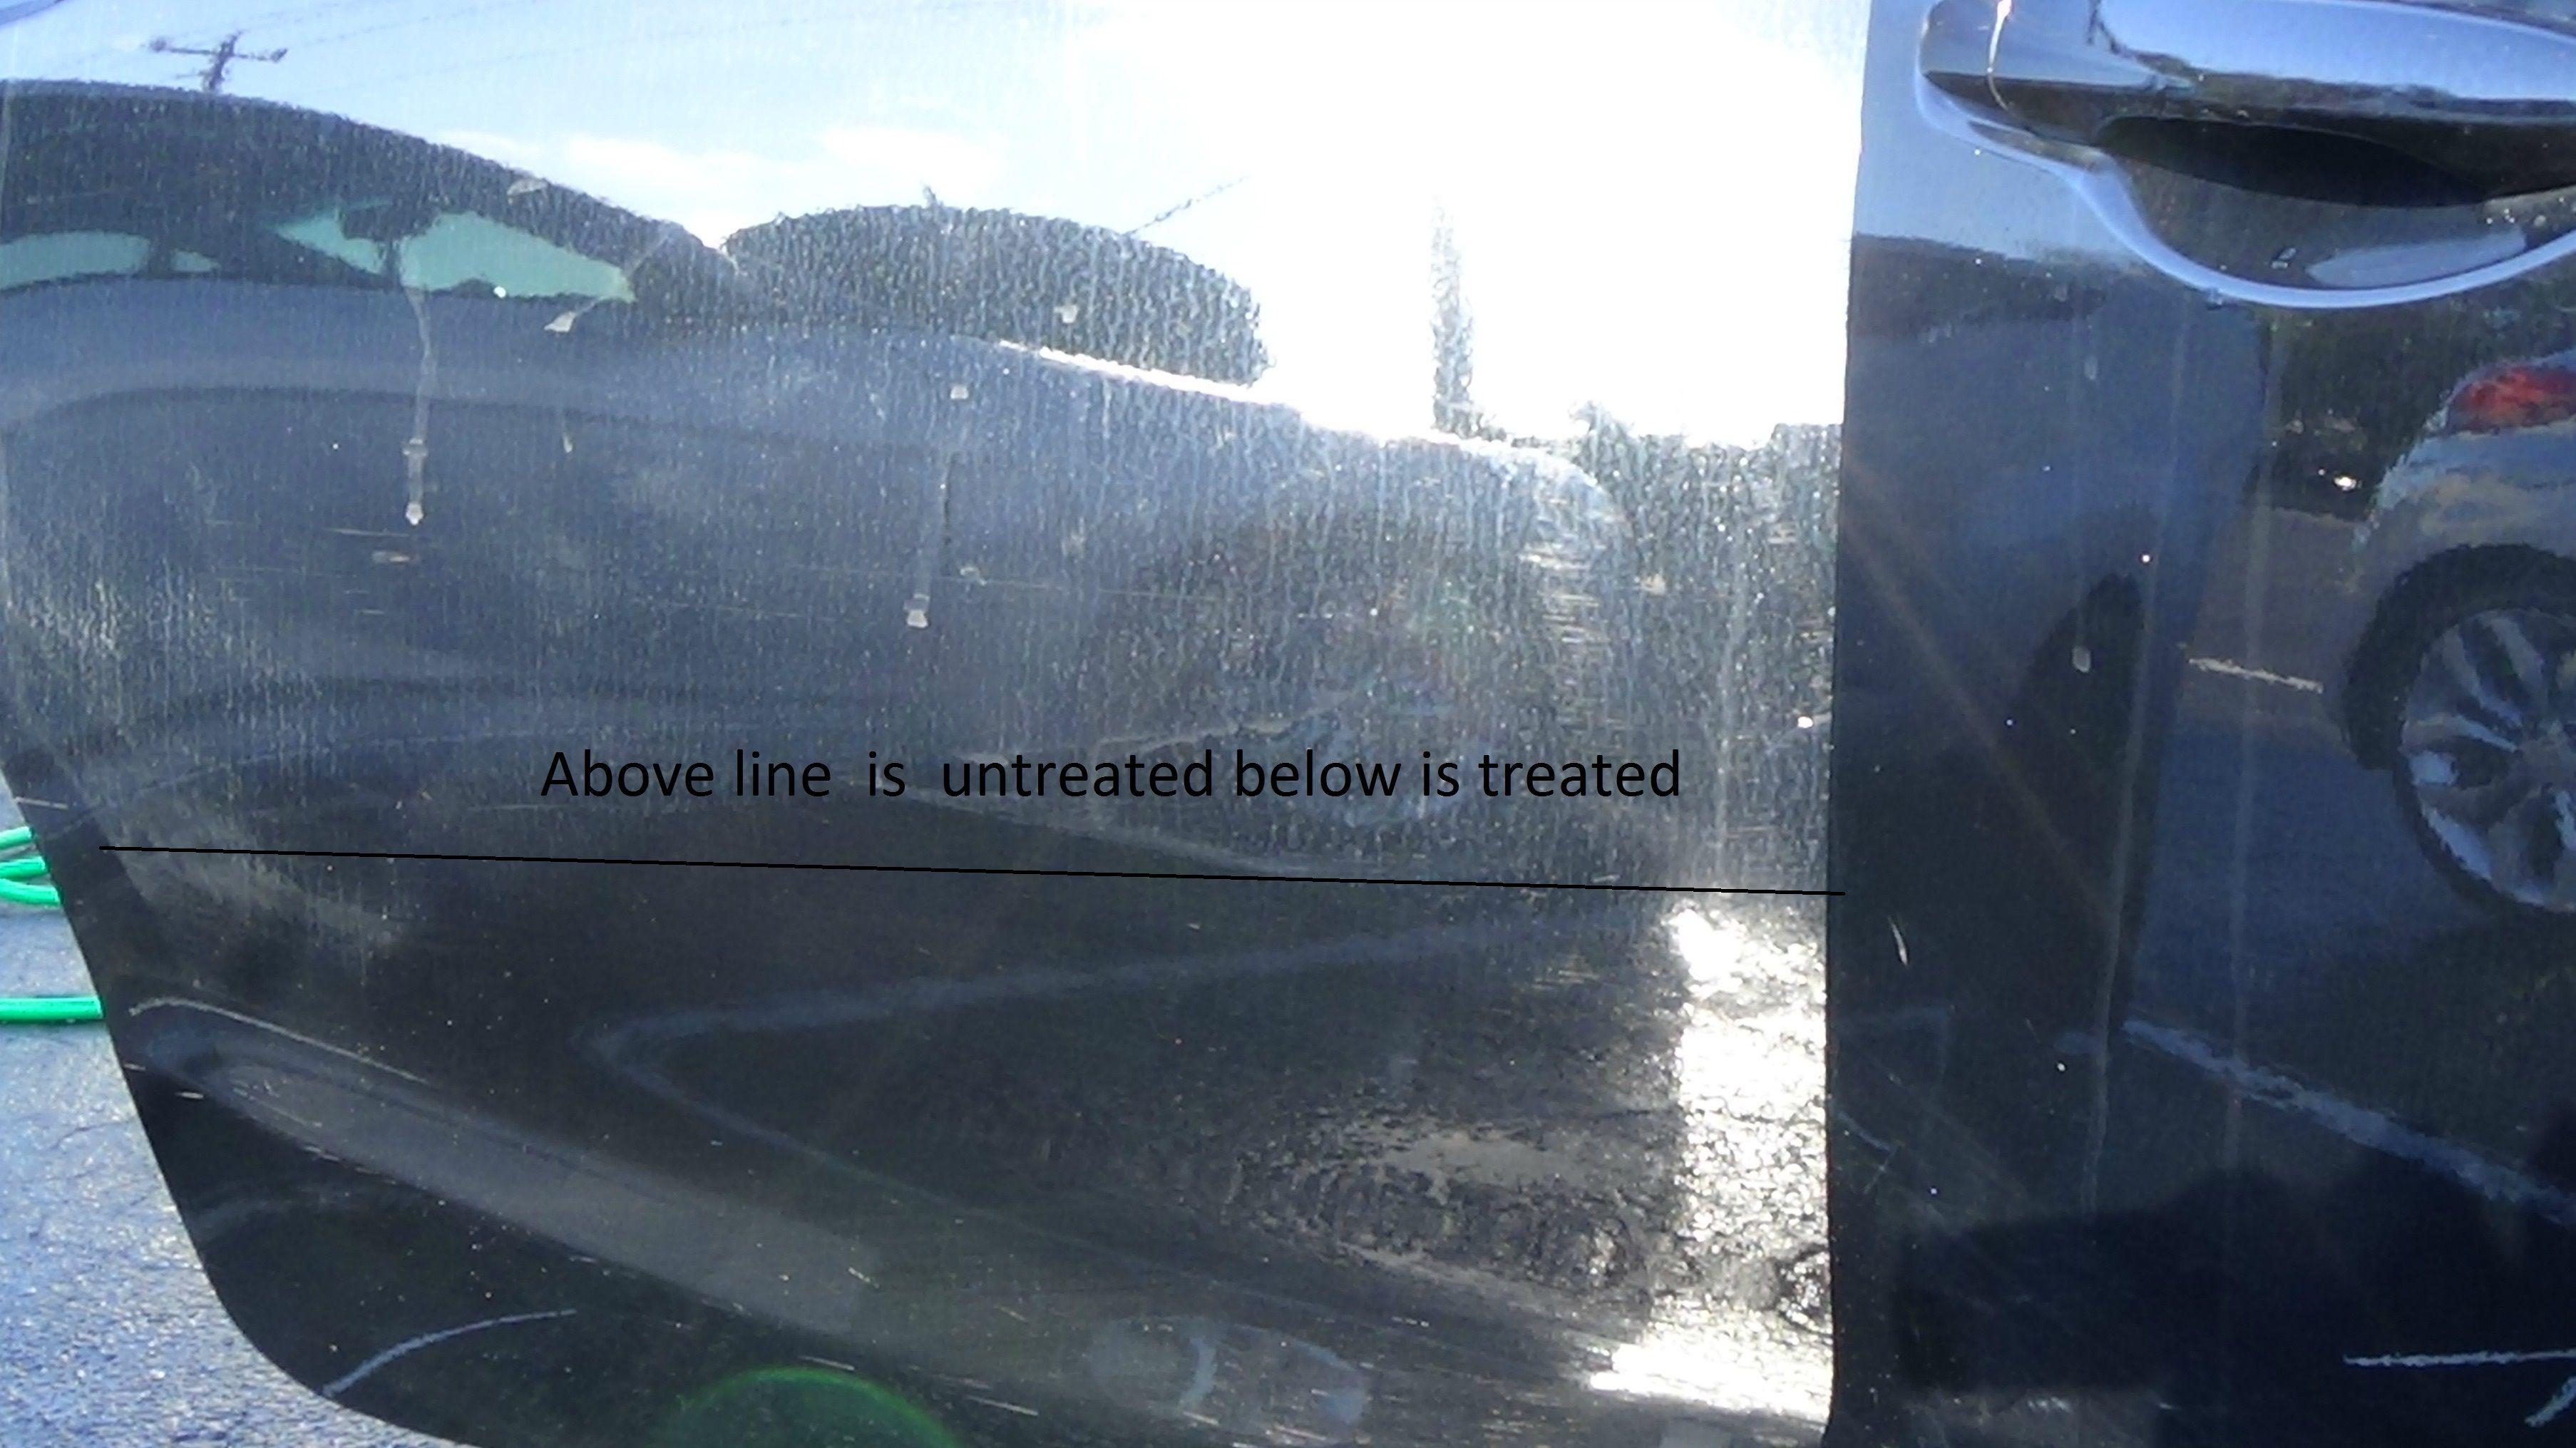 97cfb139e522ff5cdaf11aa383472b62 - How To Get Hard Water Spots Off Car Windshield